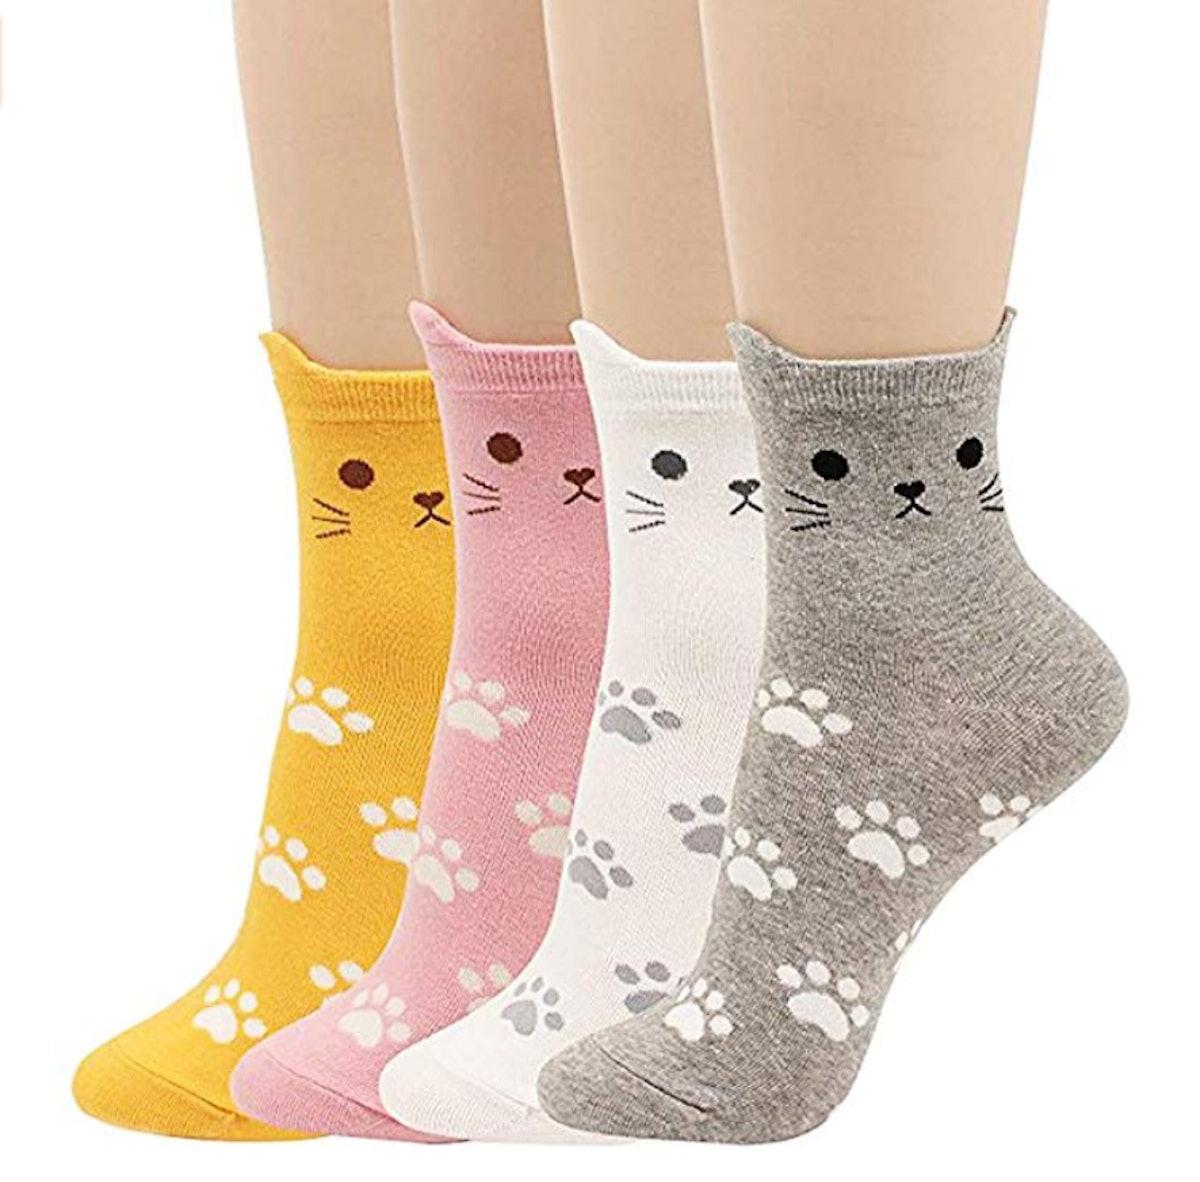 JJSocks Cute Crazy Cat Socks